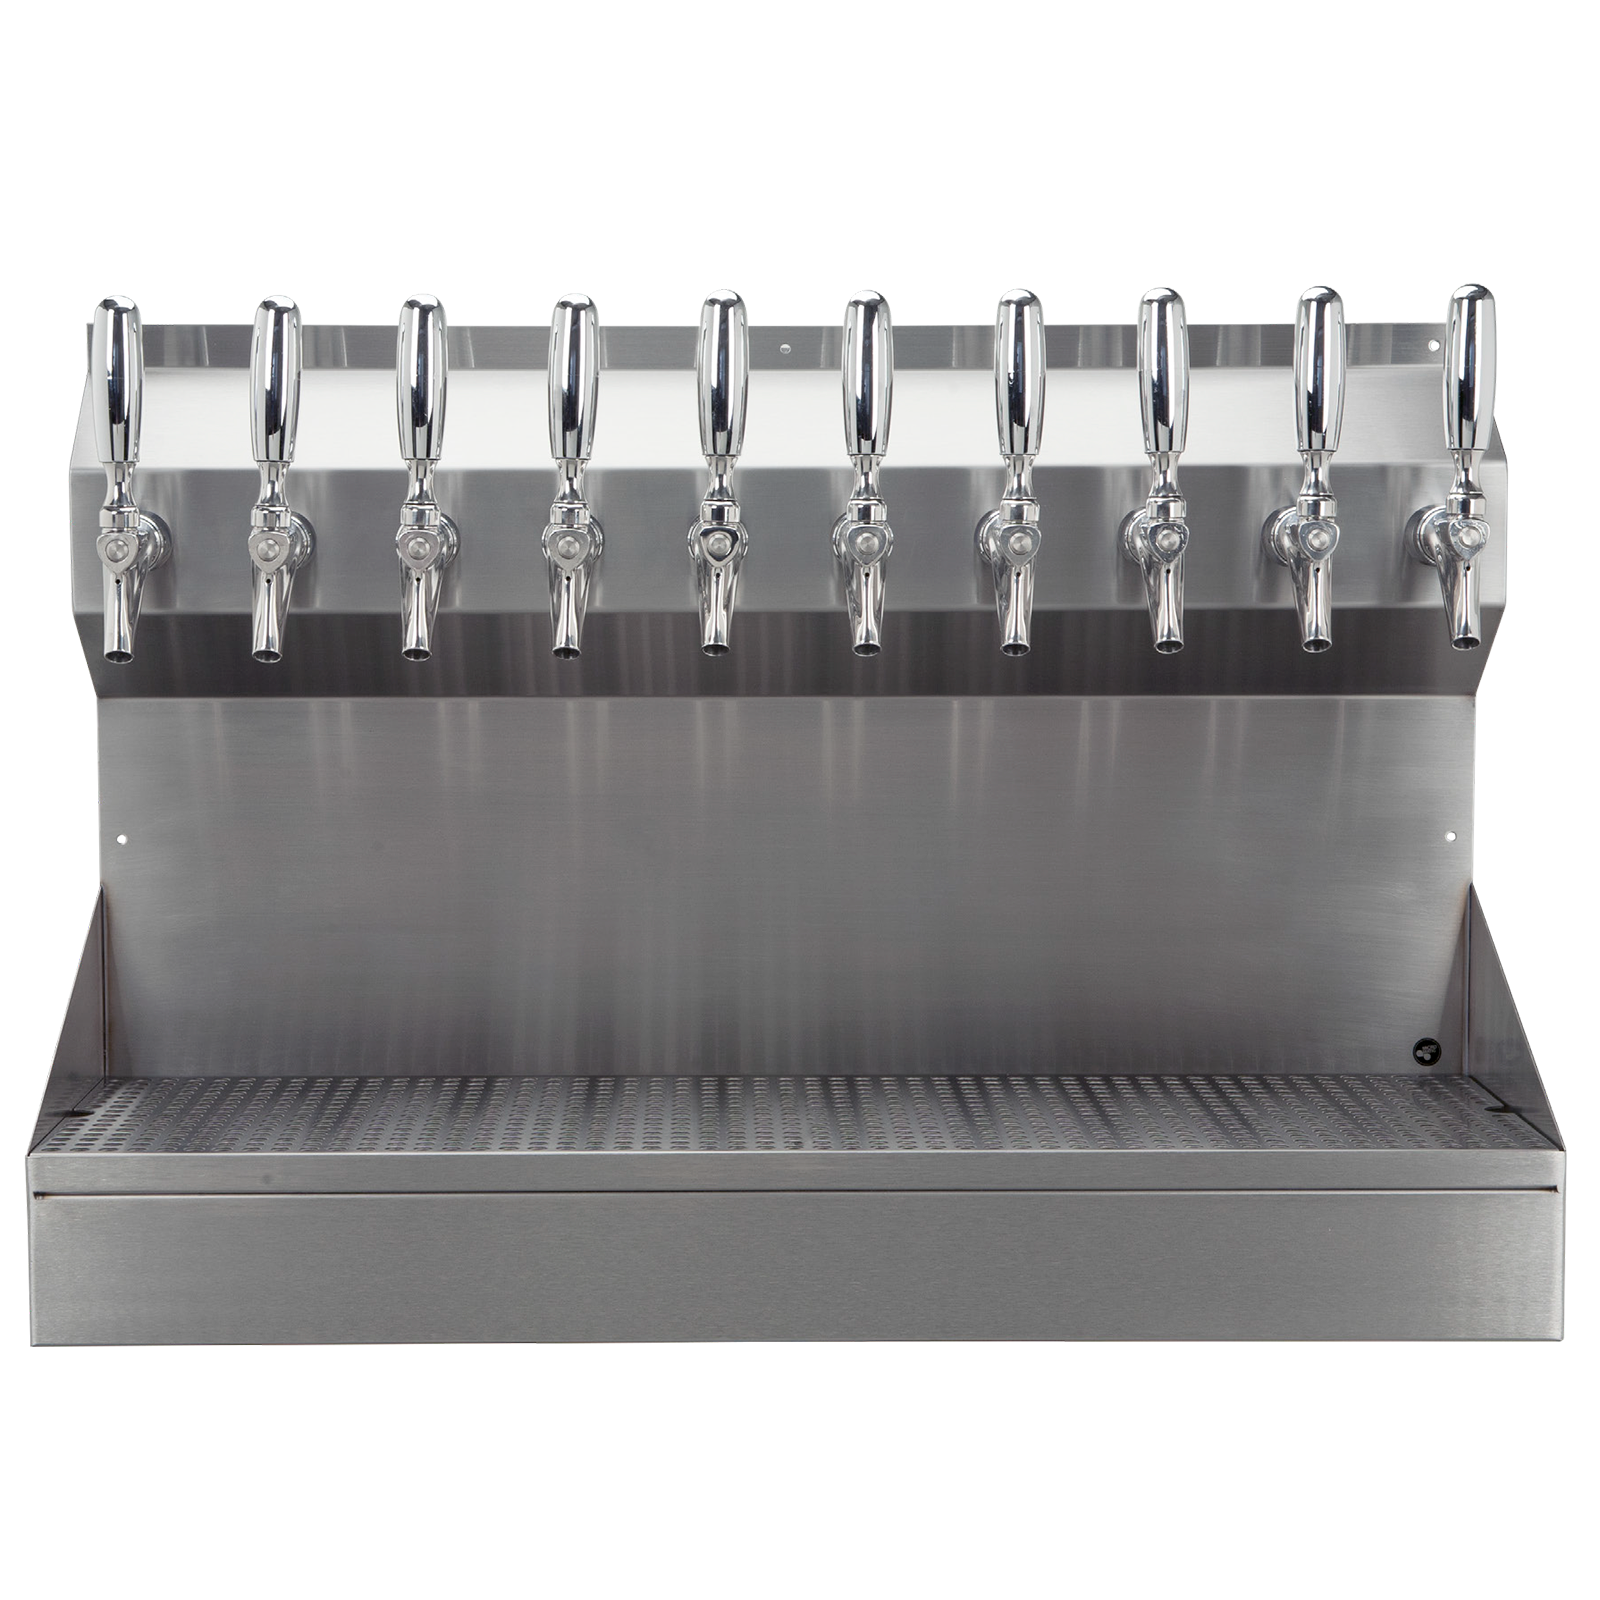 Micro Matic USA KRONOS-10SSKR draft beer / wine dispensing tower